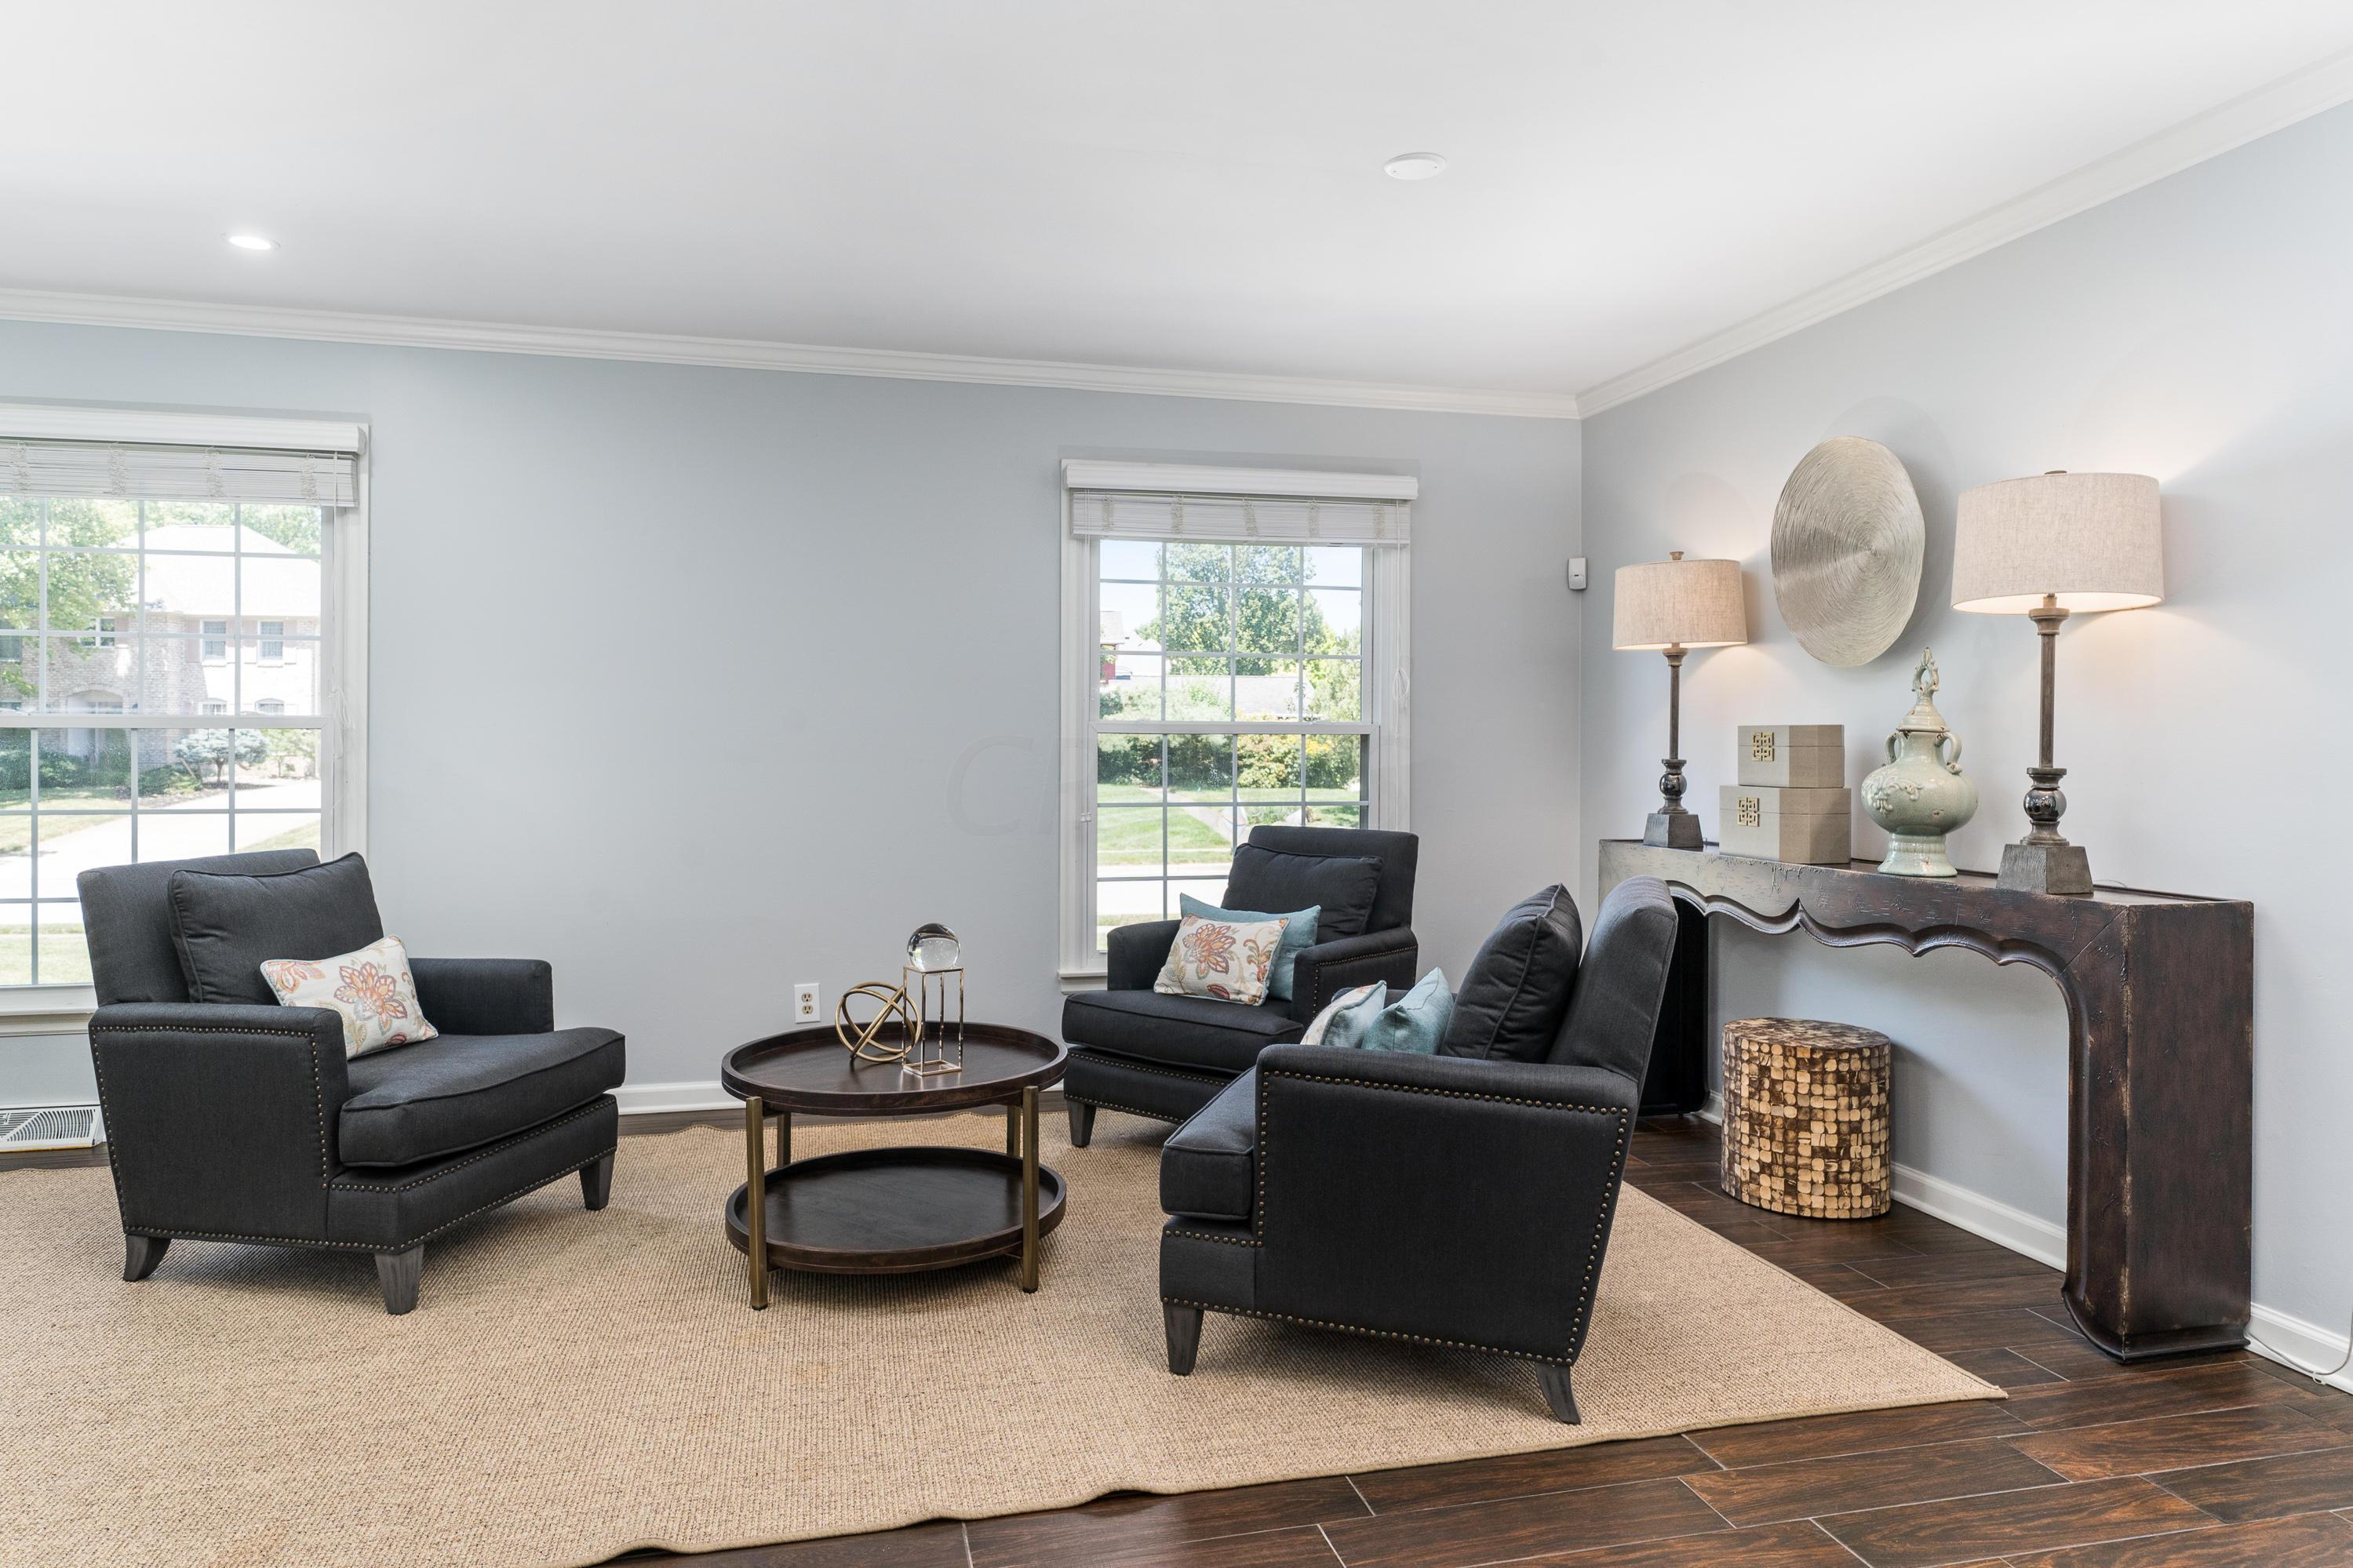 1225 Marlyn Drive, Upper Arlington, Ohio 43220, 4 Bedrooms Bedrooms, ,4 BathroomsBathrooms,Residential,For Sale,Marlyn,220025365